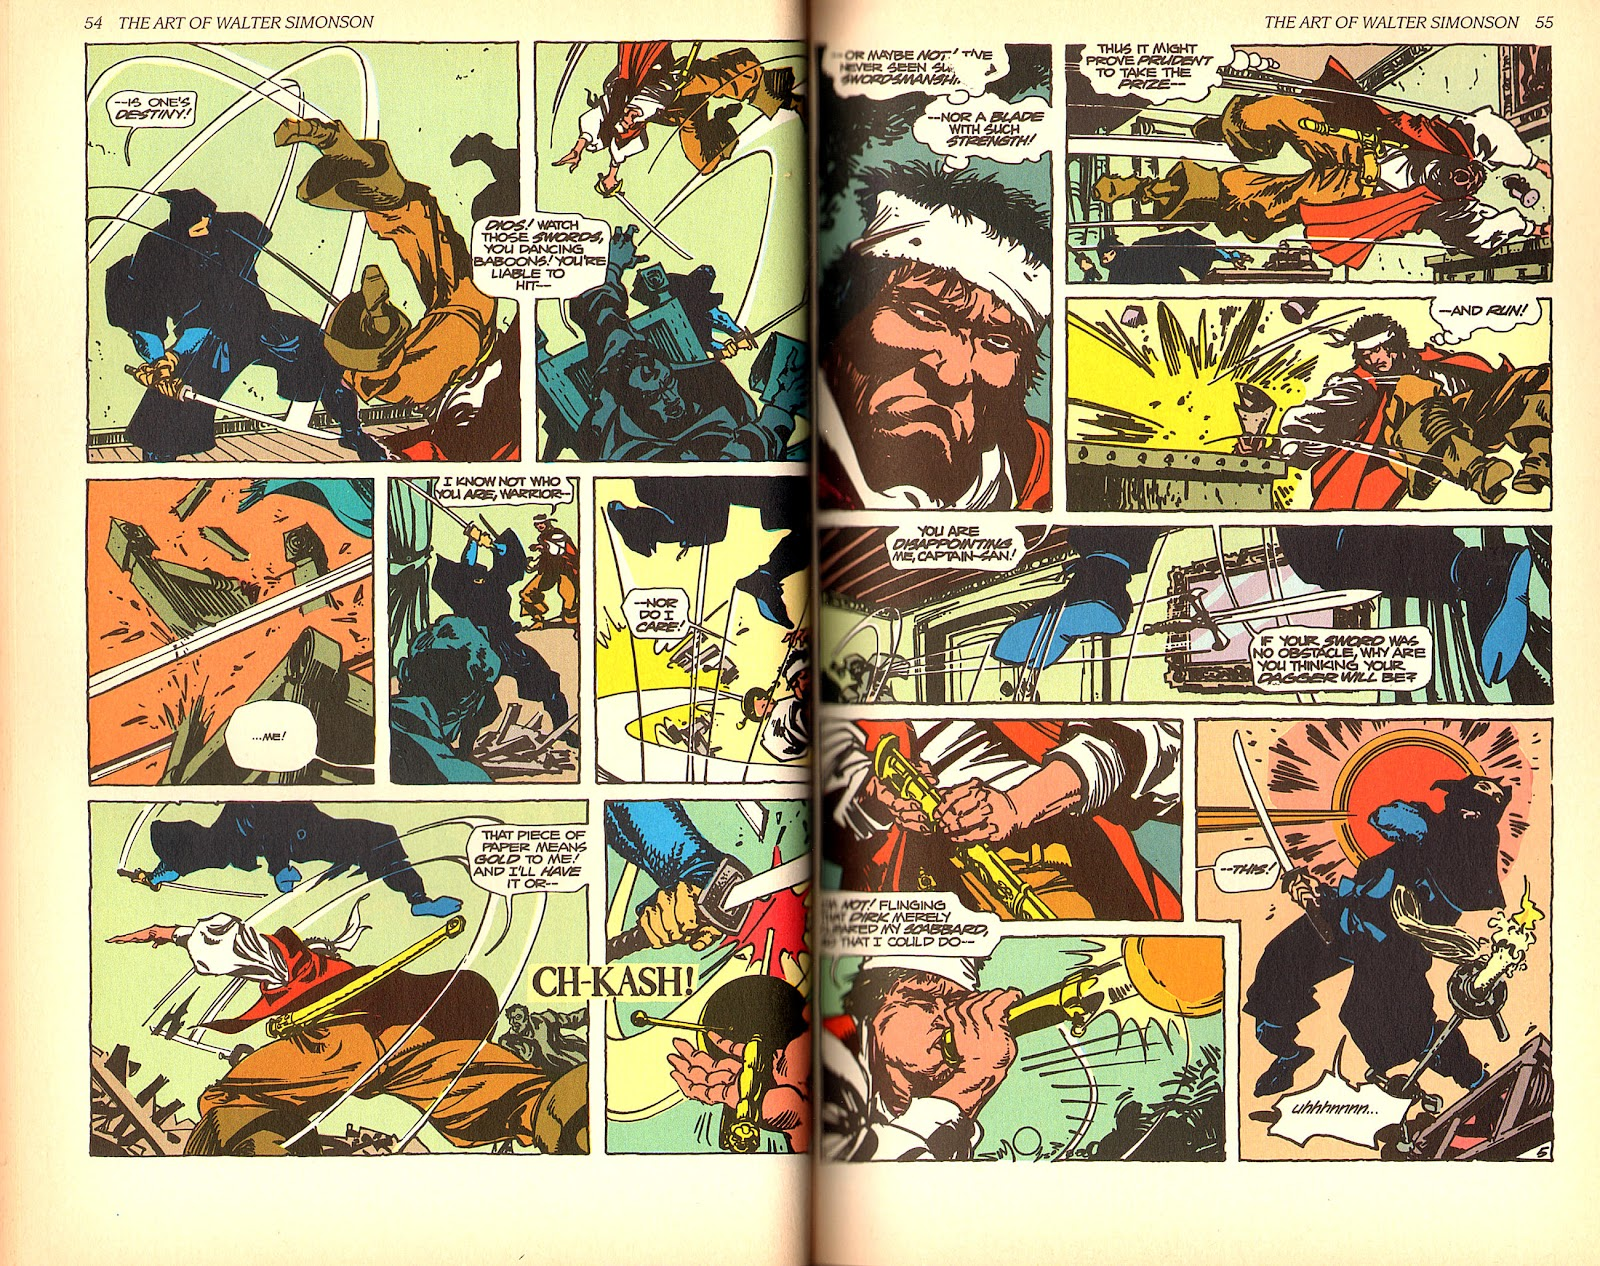 Read online The Art of Walter Simonson comic -  Issue # TPB - 29